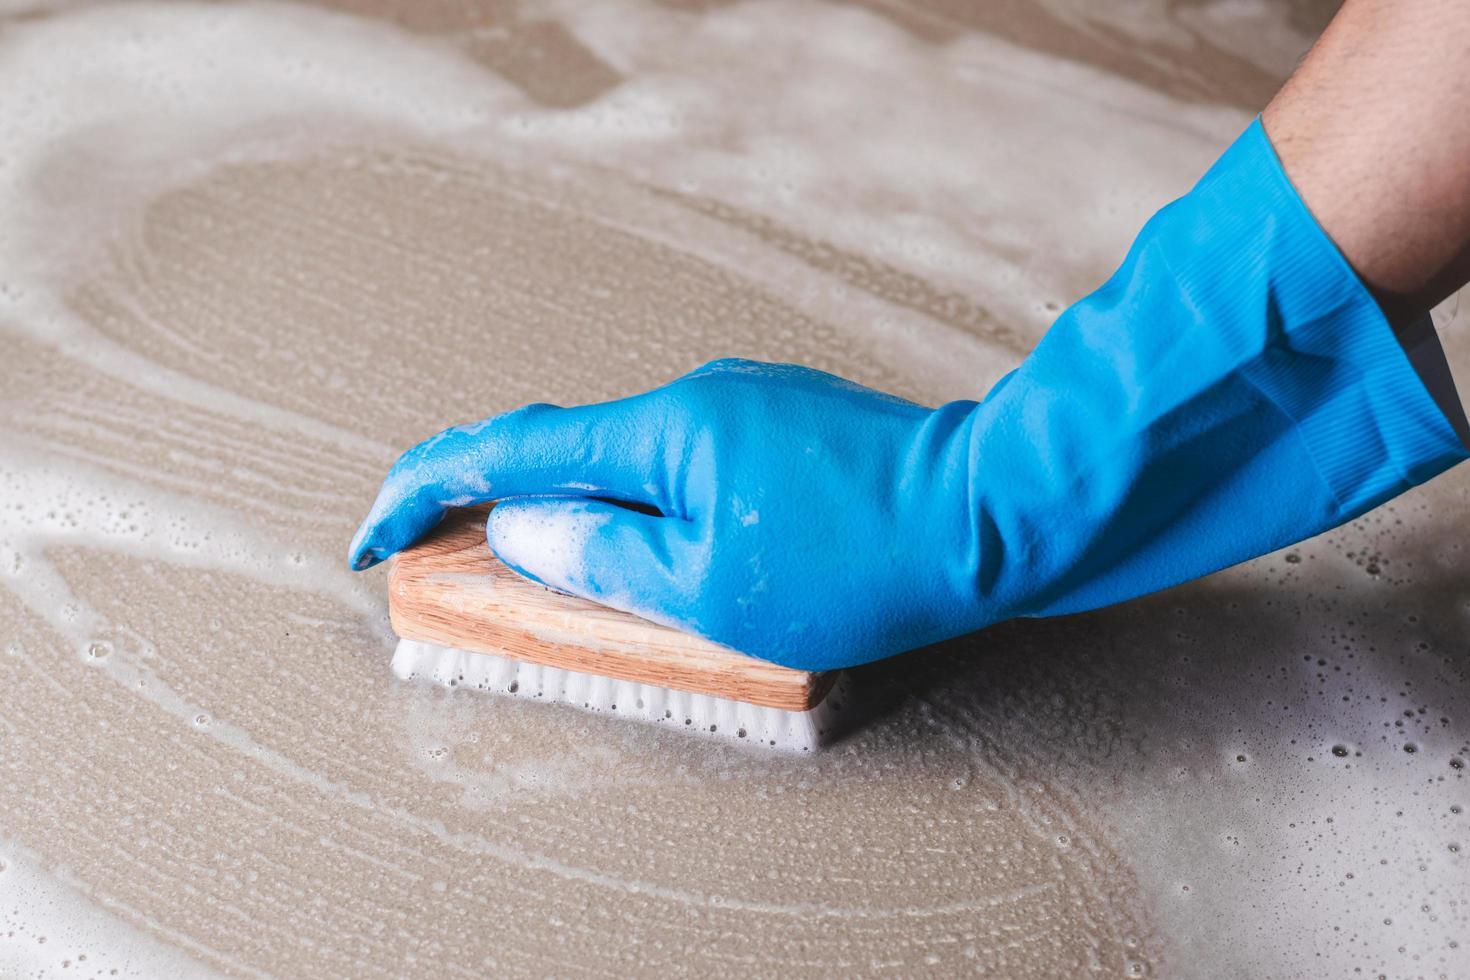 Primer plano de una persona limpiando una superficie con un cepillo foto